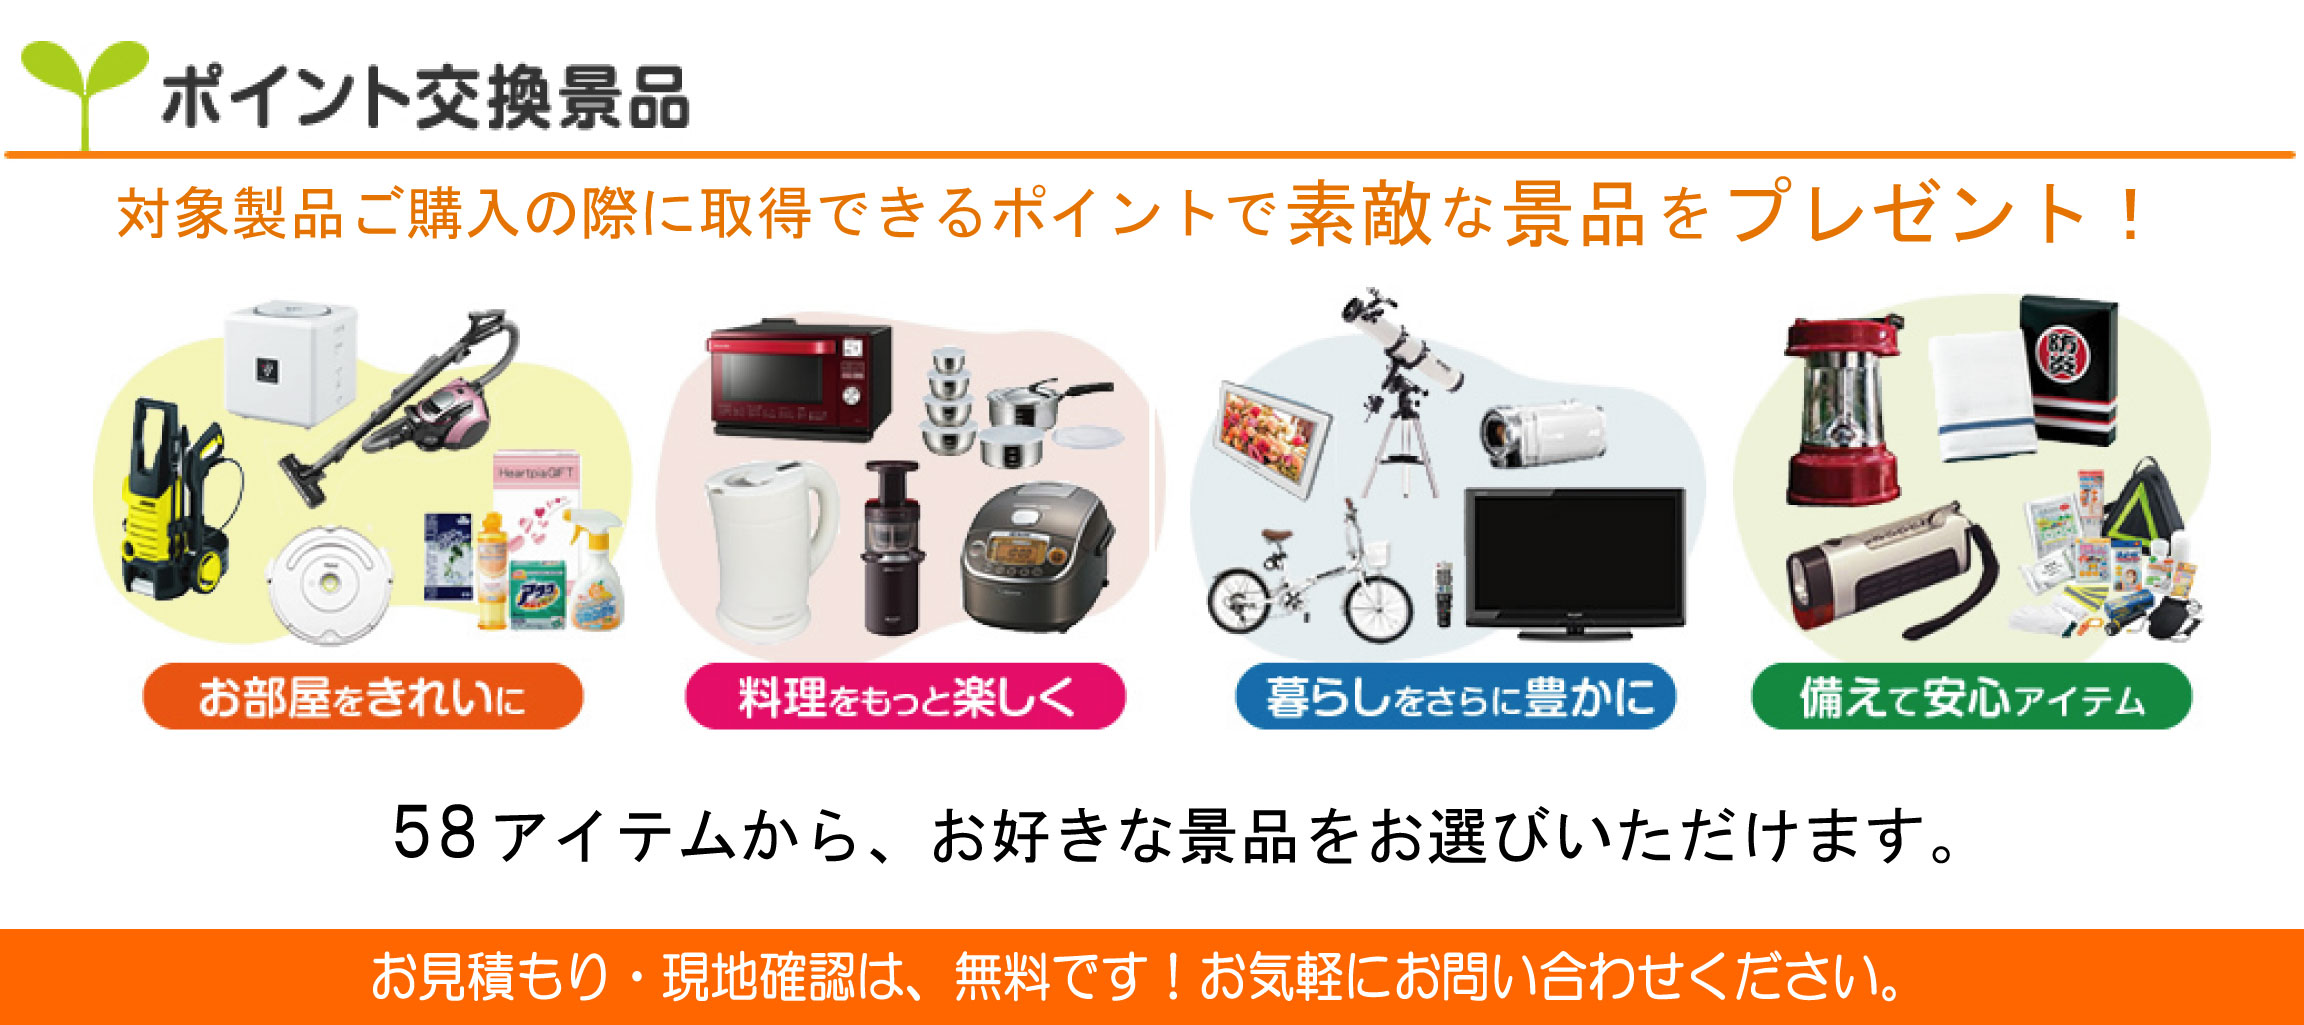 KuraSi-natu-sin67-13.jpg